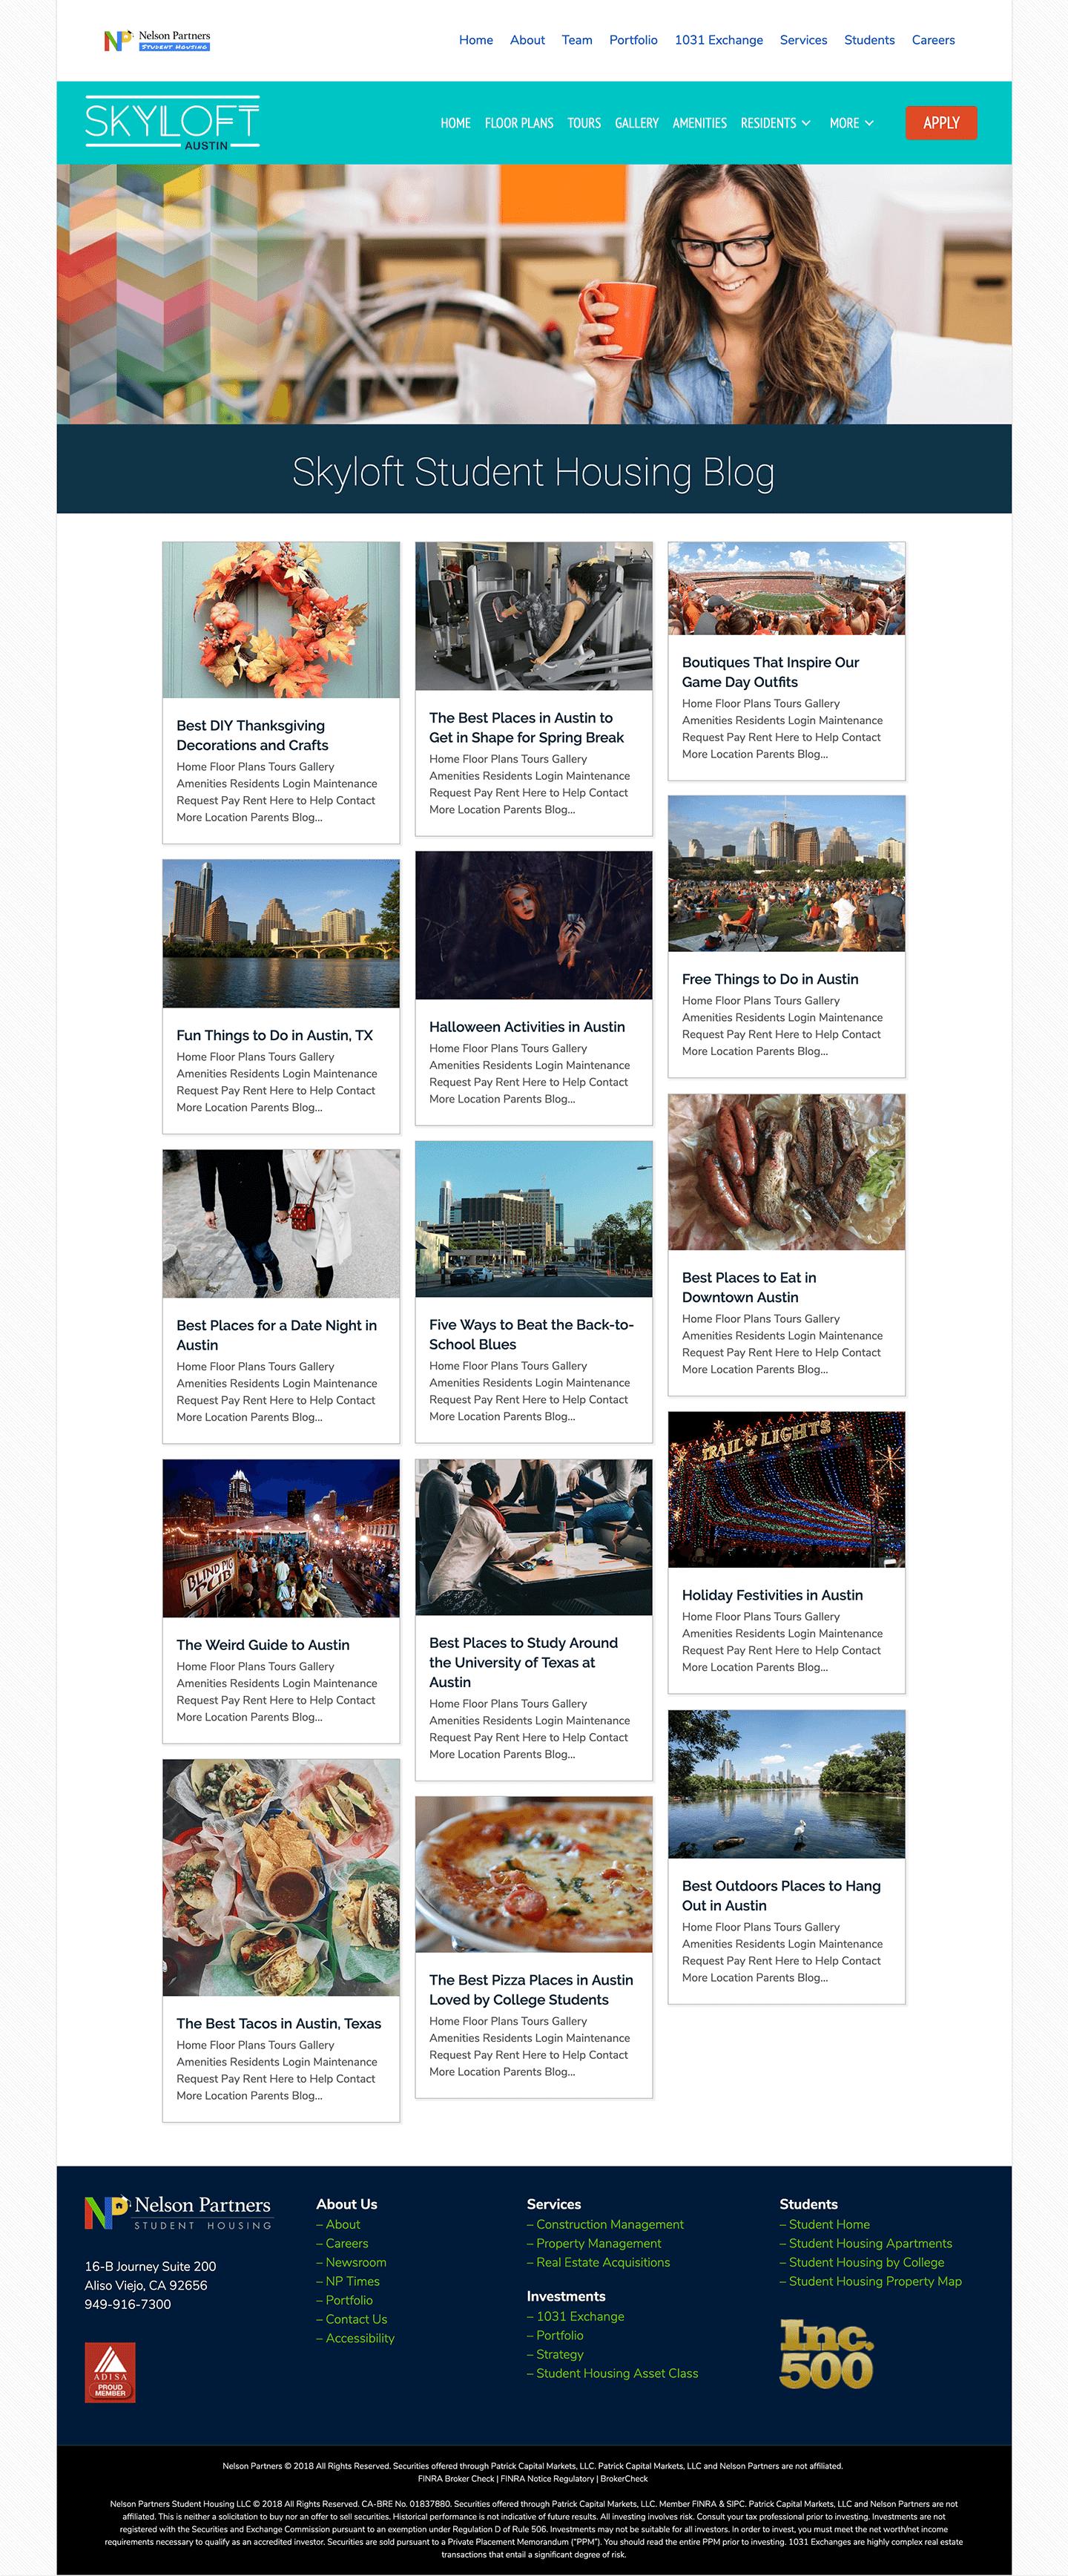 Skyloft-Student-Housing-Apartments-Website-Design-Blog-Page